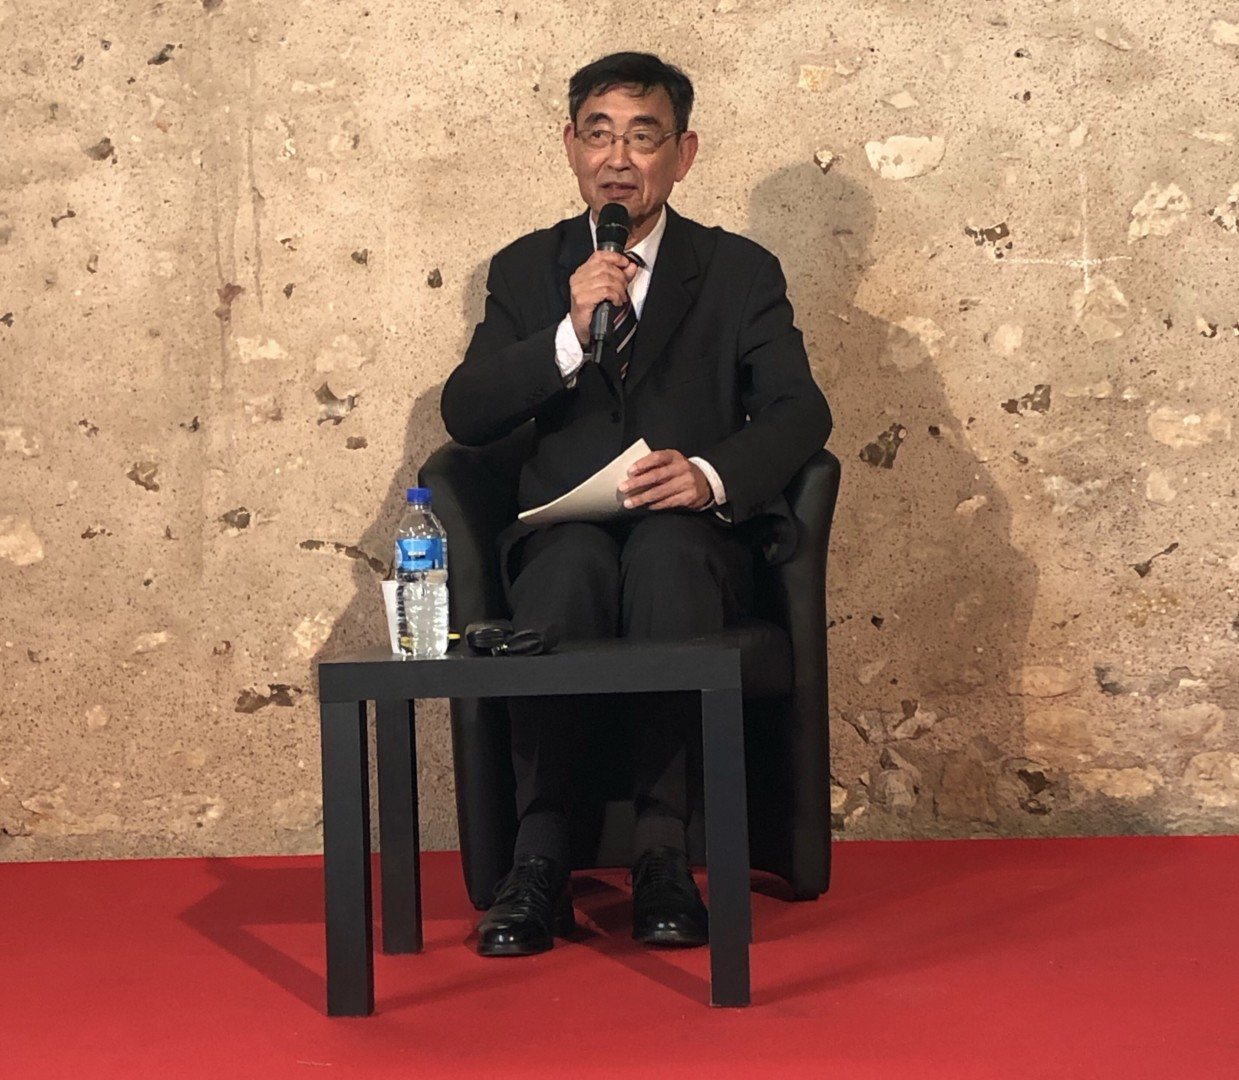 Entretien avec Kazuyoshi Yoshikawa - Proustonomics